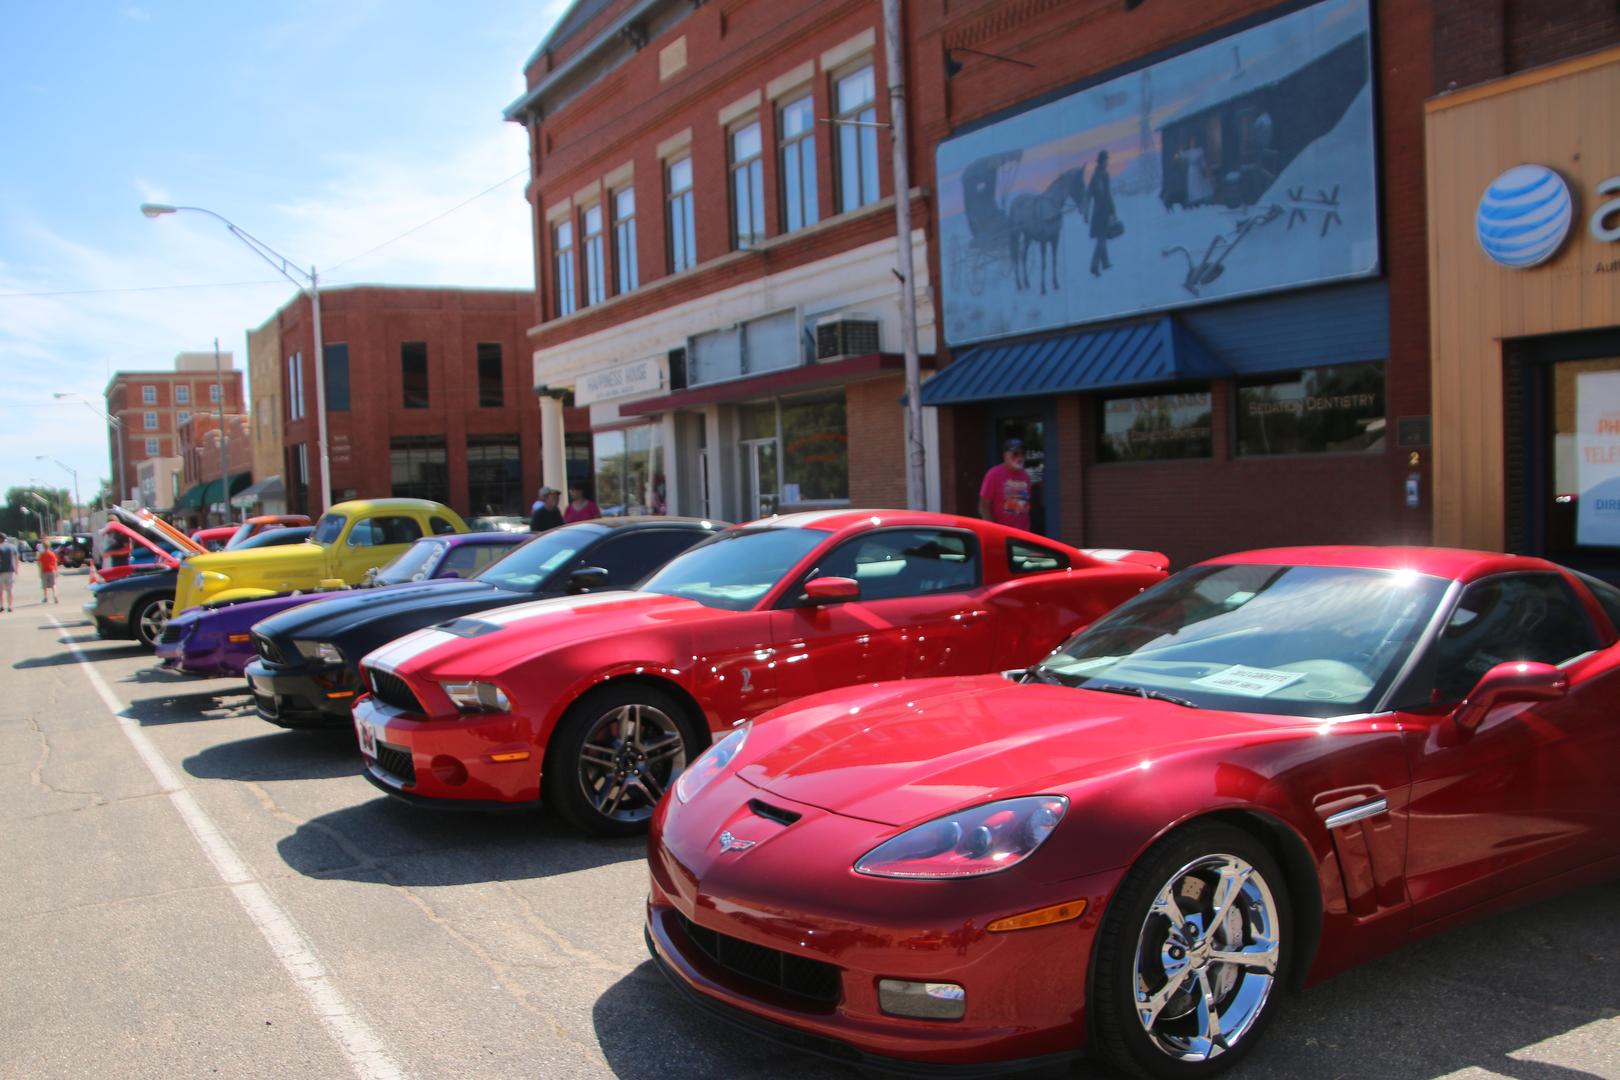 big cruise and car show car show free car show